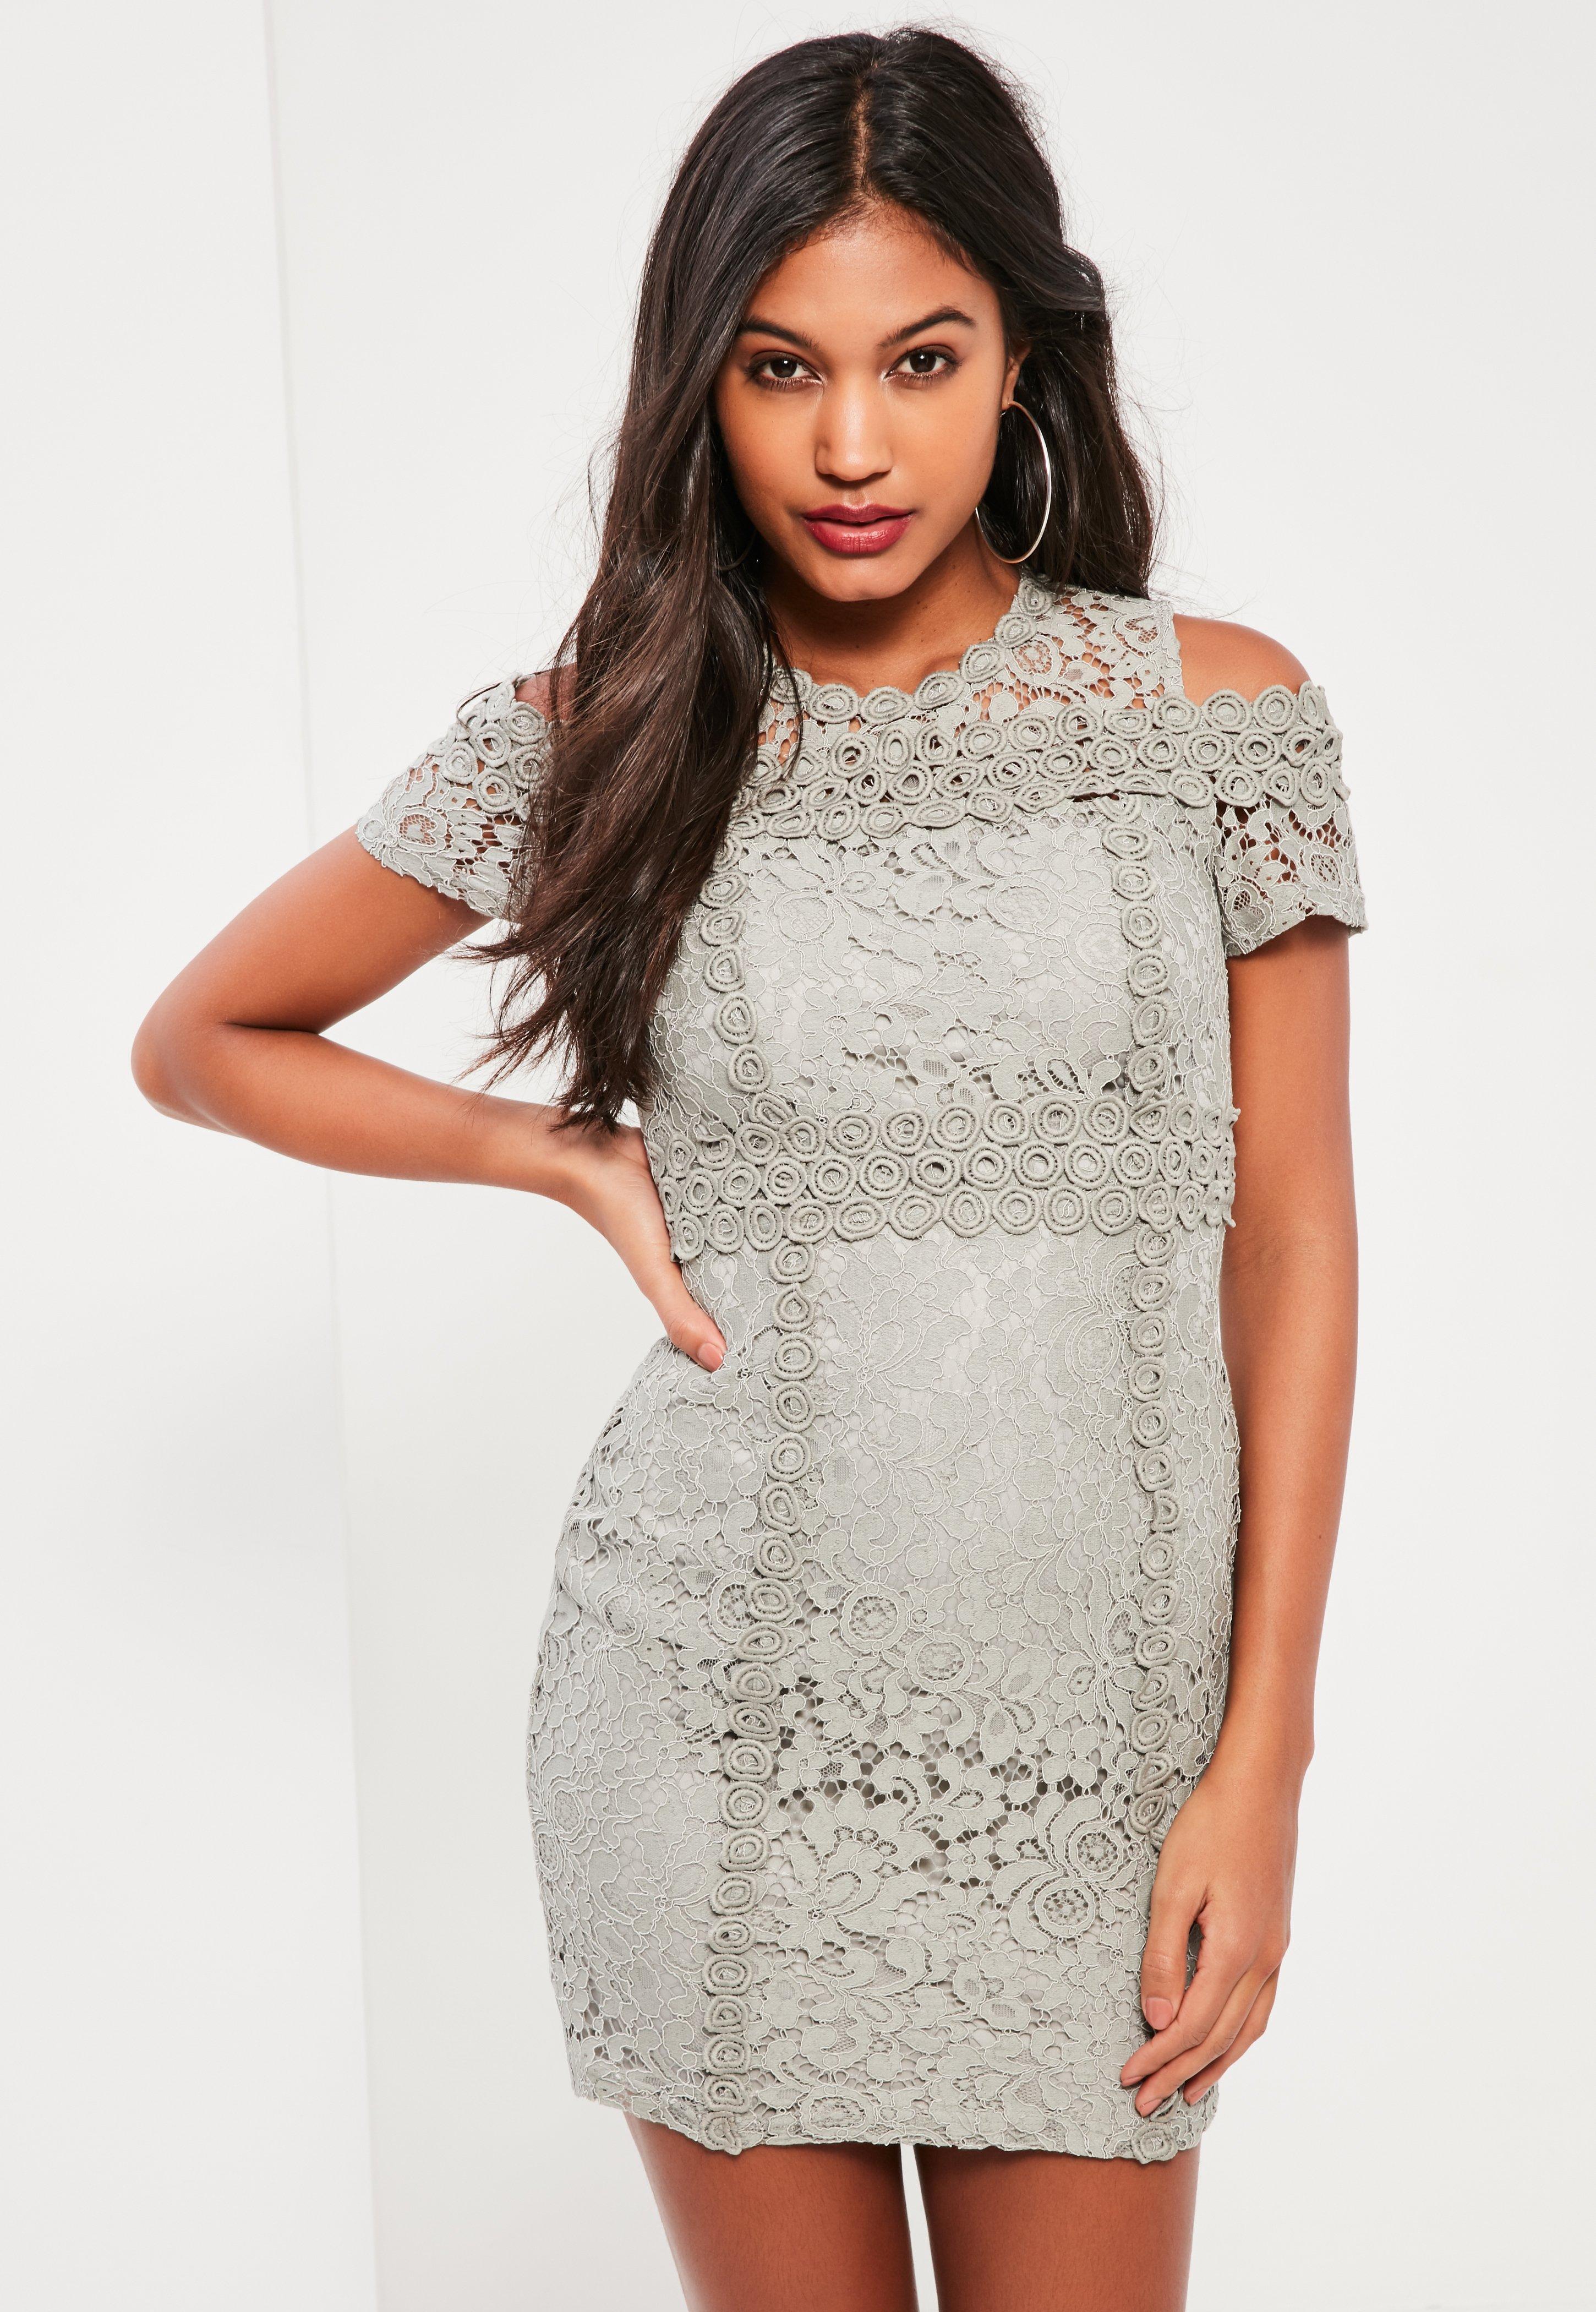 Wedding Gray Lace Dress grey lace cold shoulder bodycon dress previous next